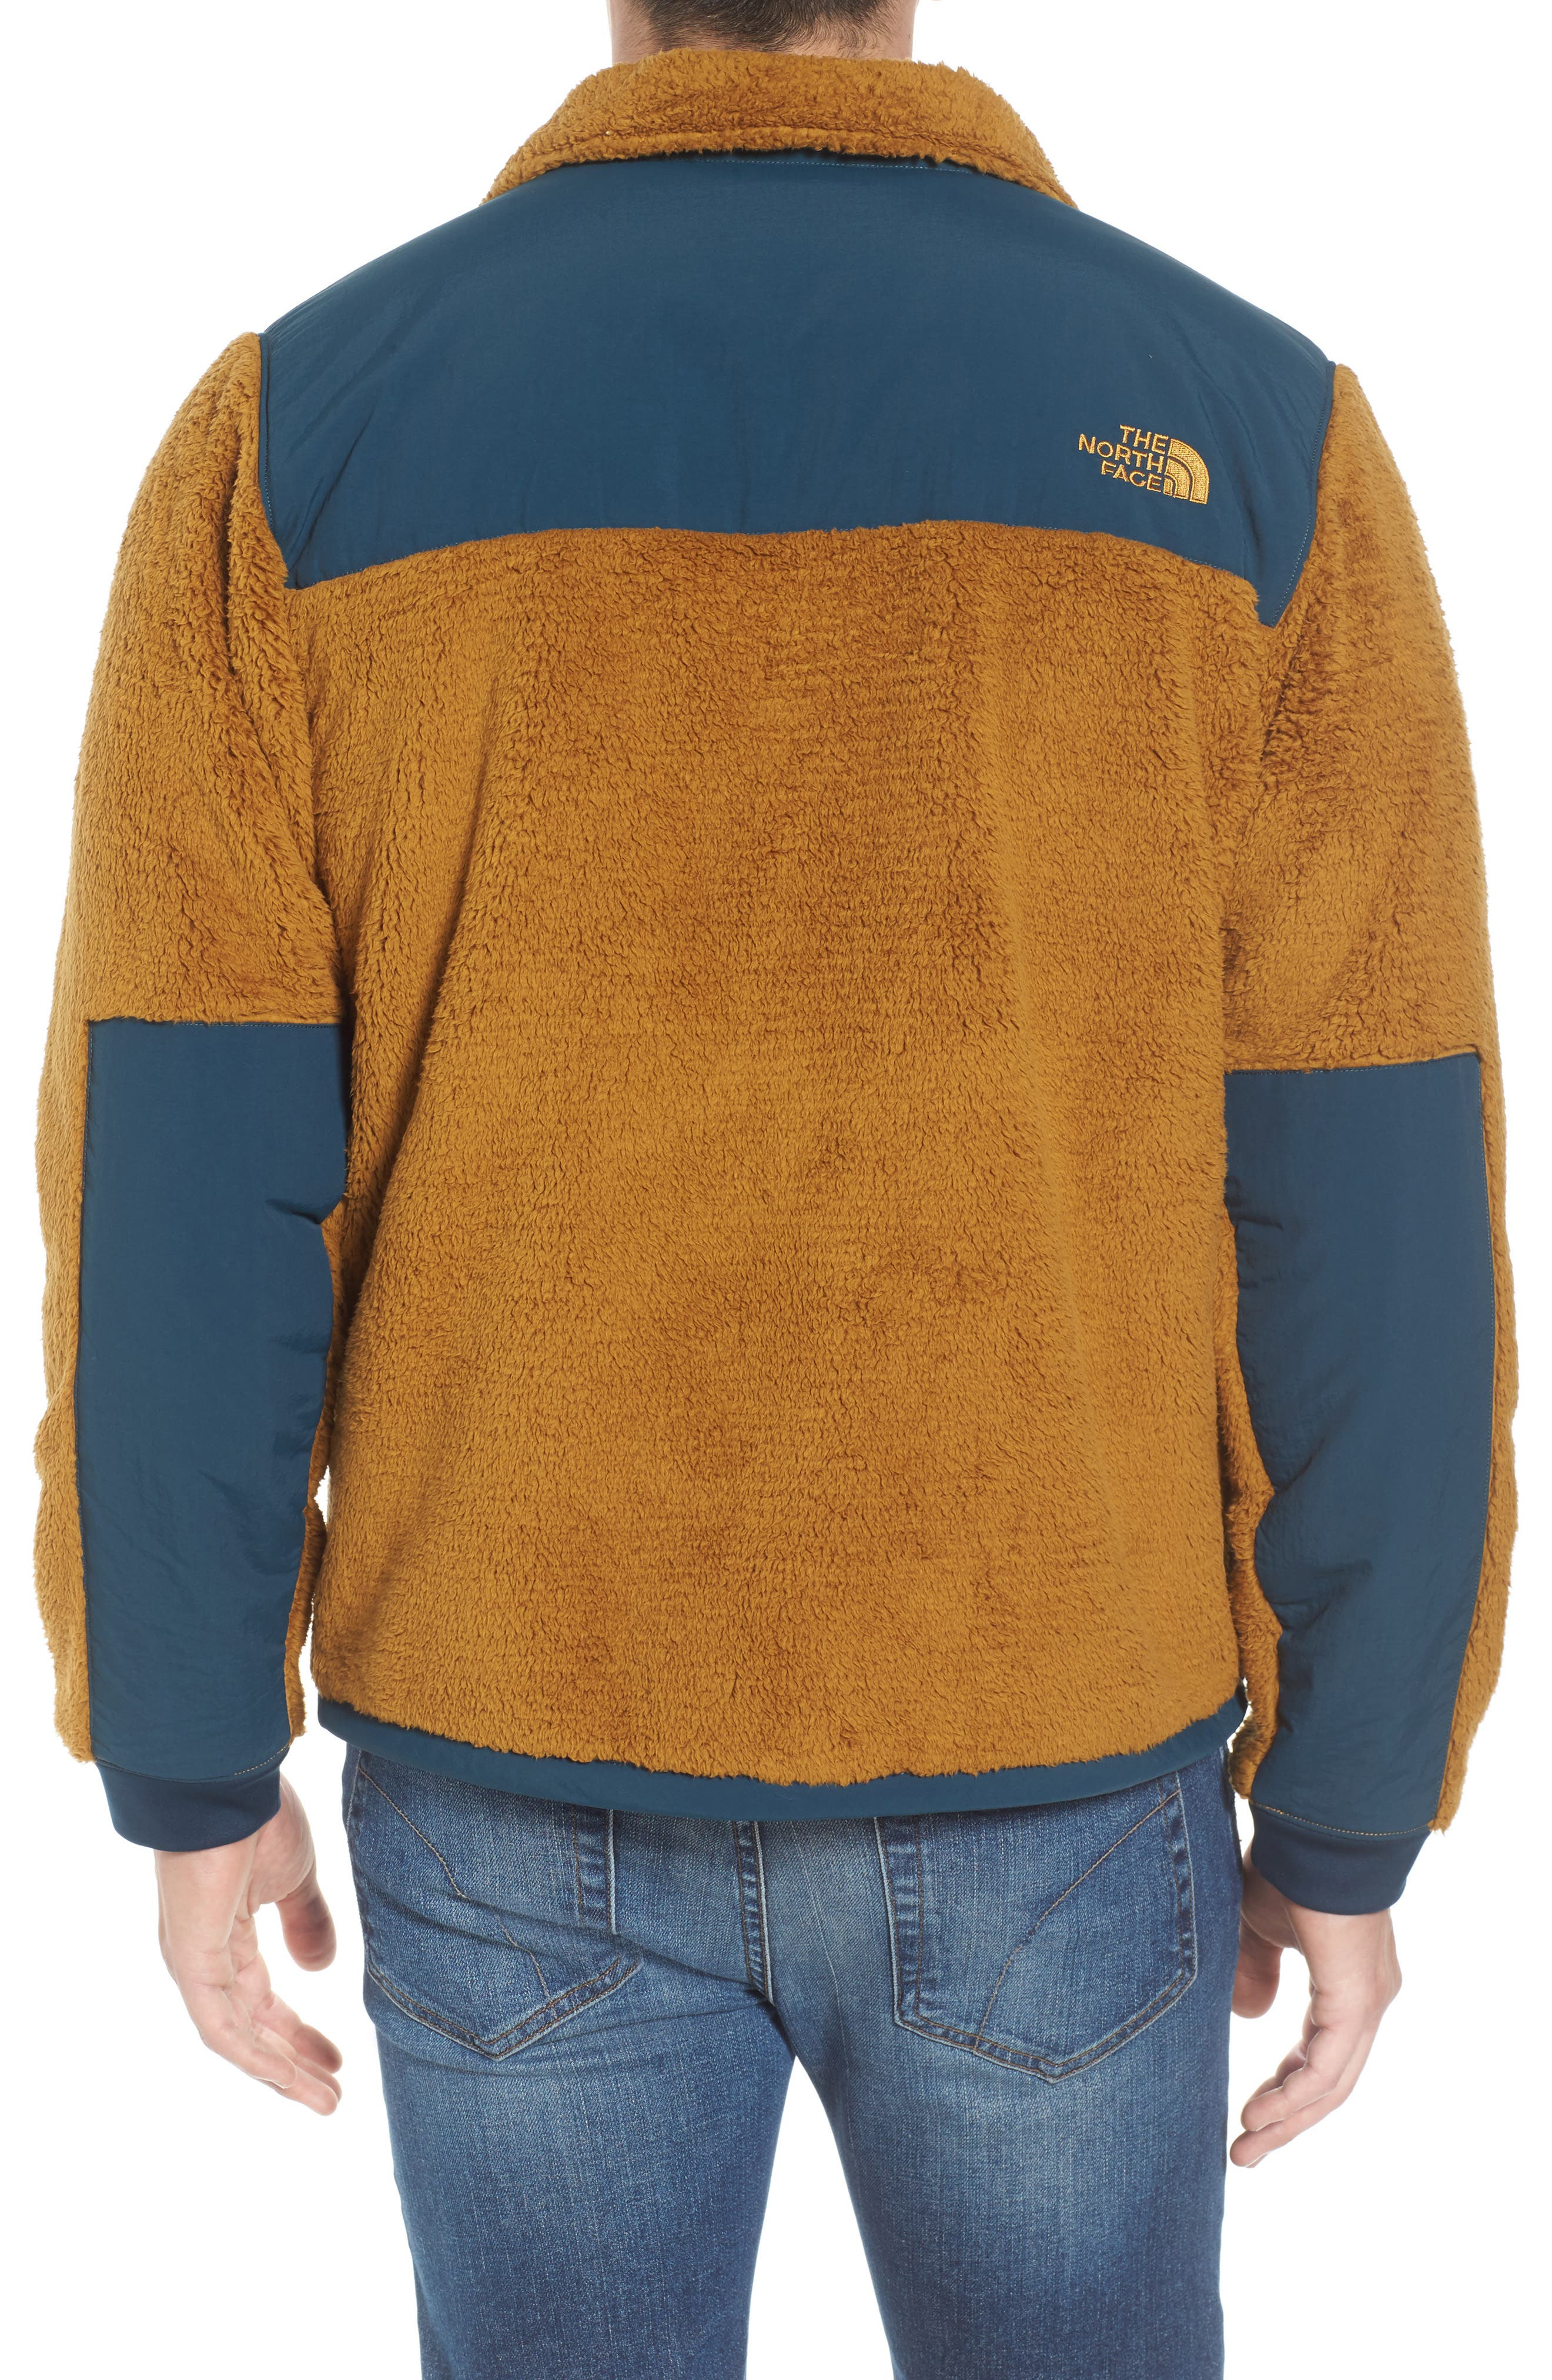 Novelty Denali Jacket,                             Alternate thumbnail 2, color,                             211